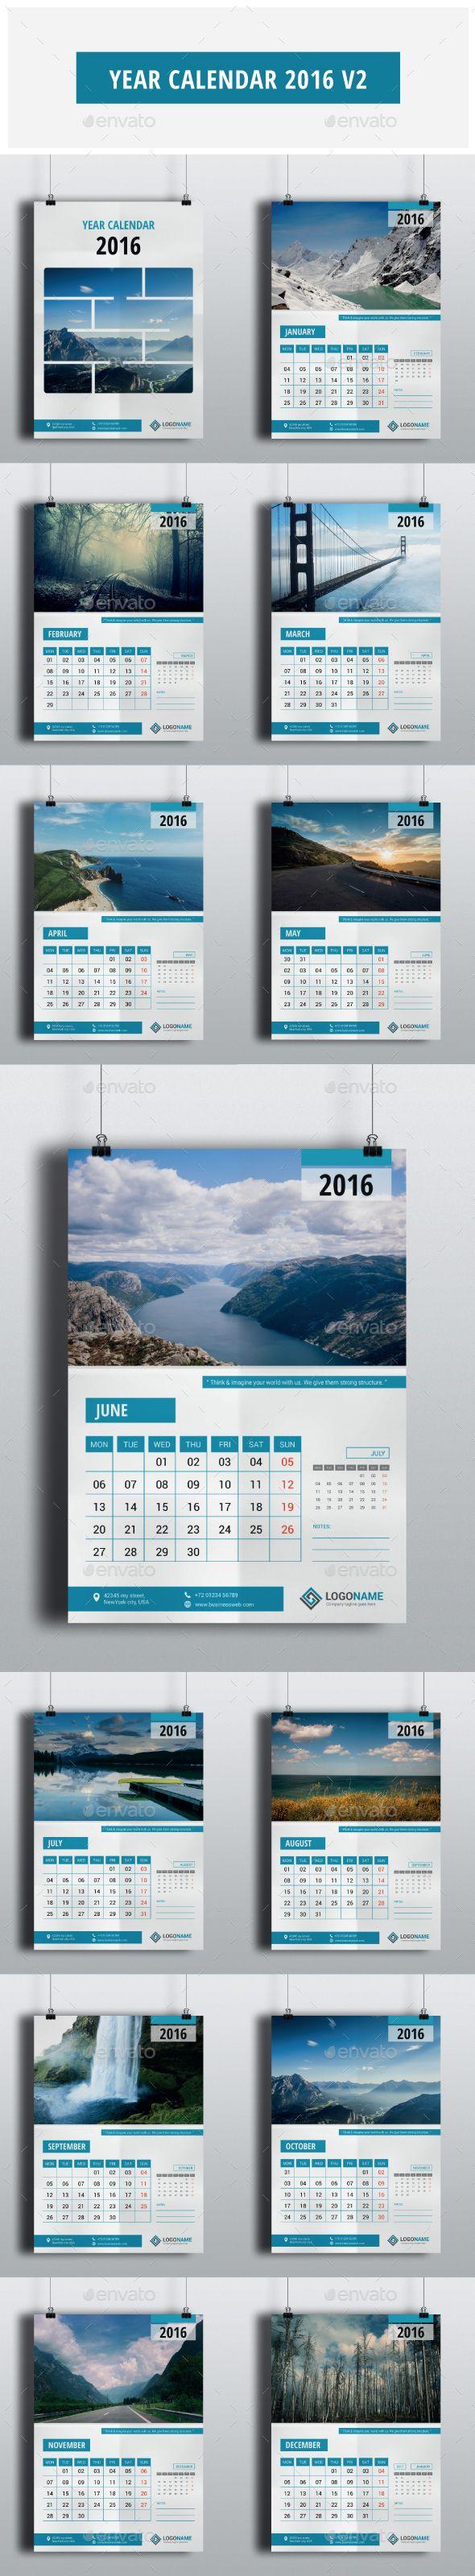 Year Calendar 2016 Vector Template EPS, AI #design Download: http://graphicriver.net/item/year-calendar-2016-v2/13602929?ref=ksioks